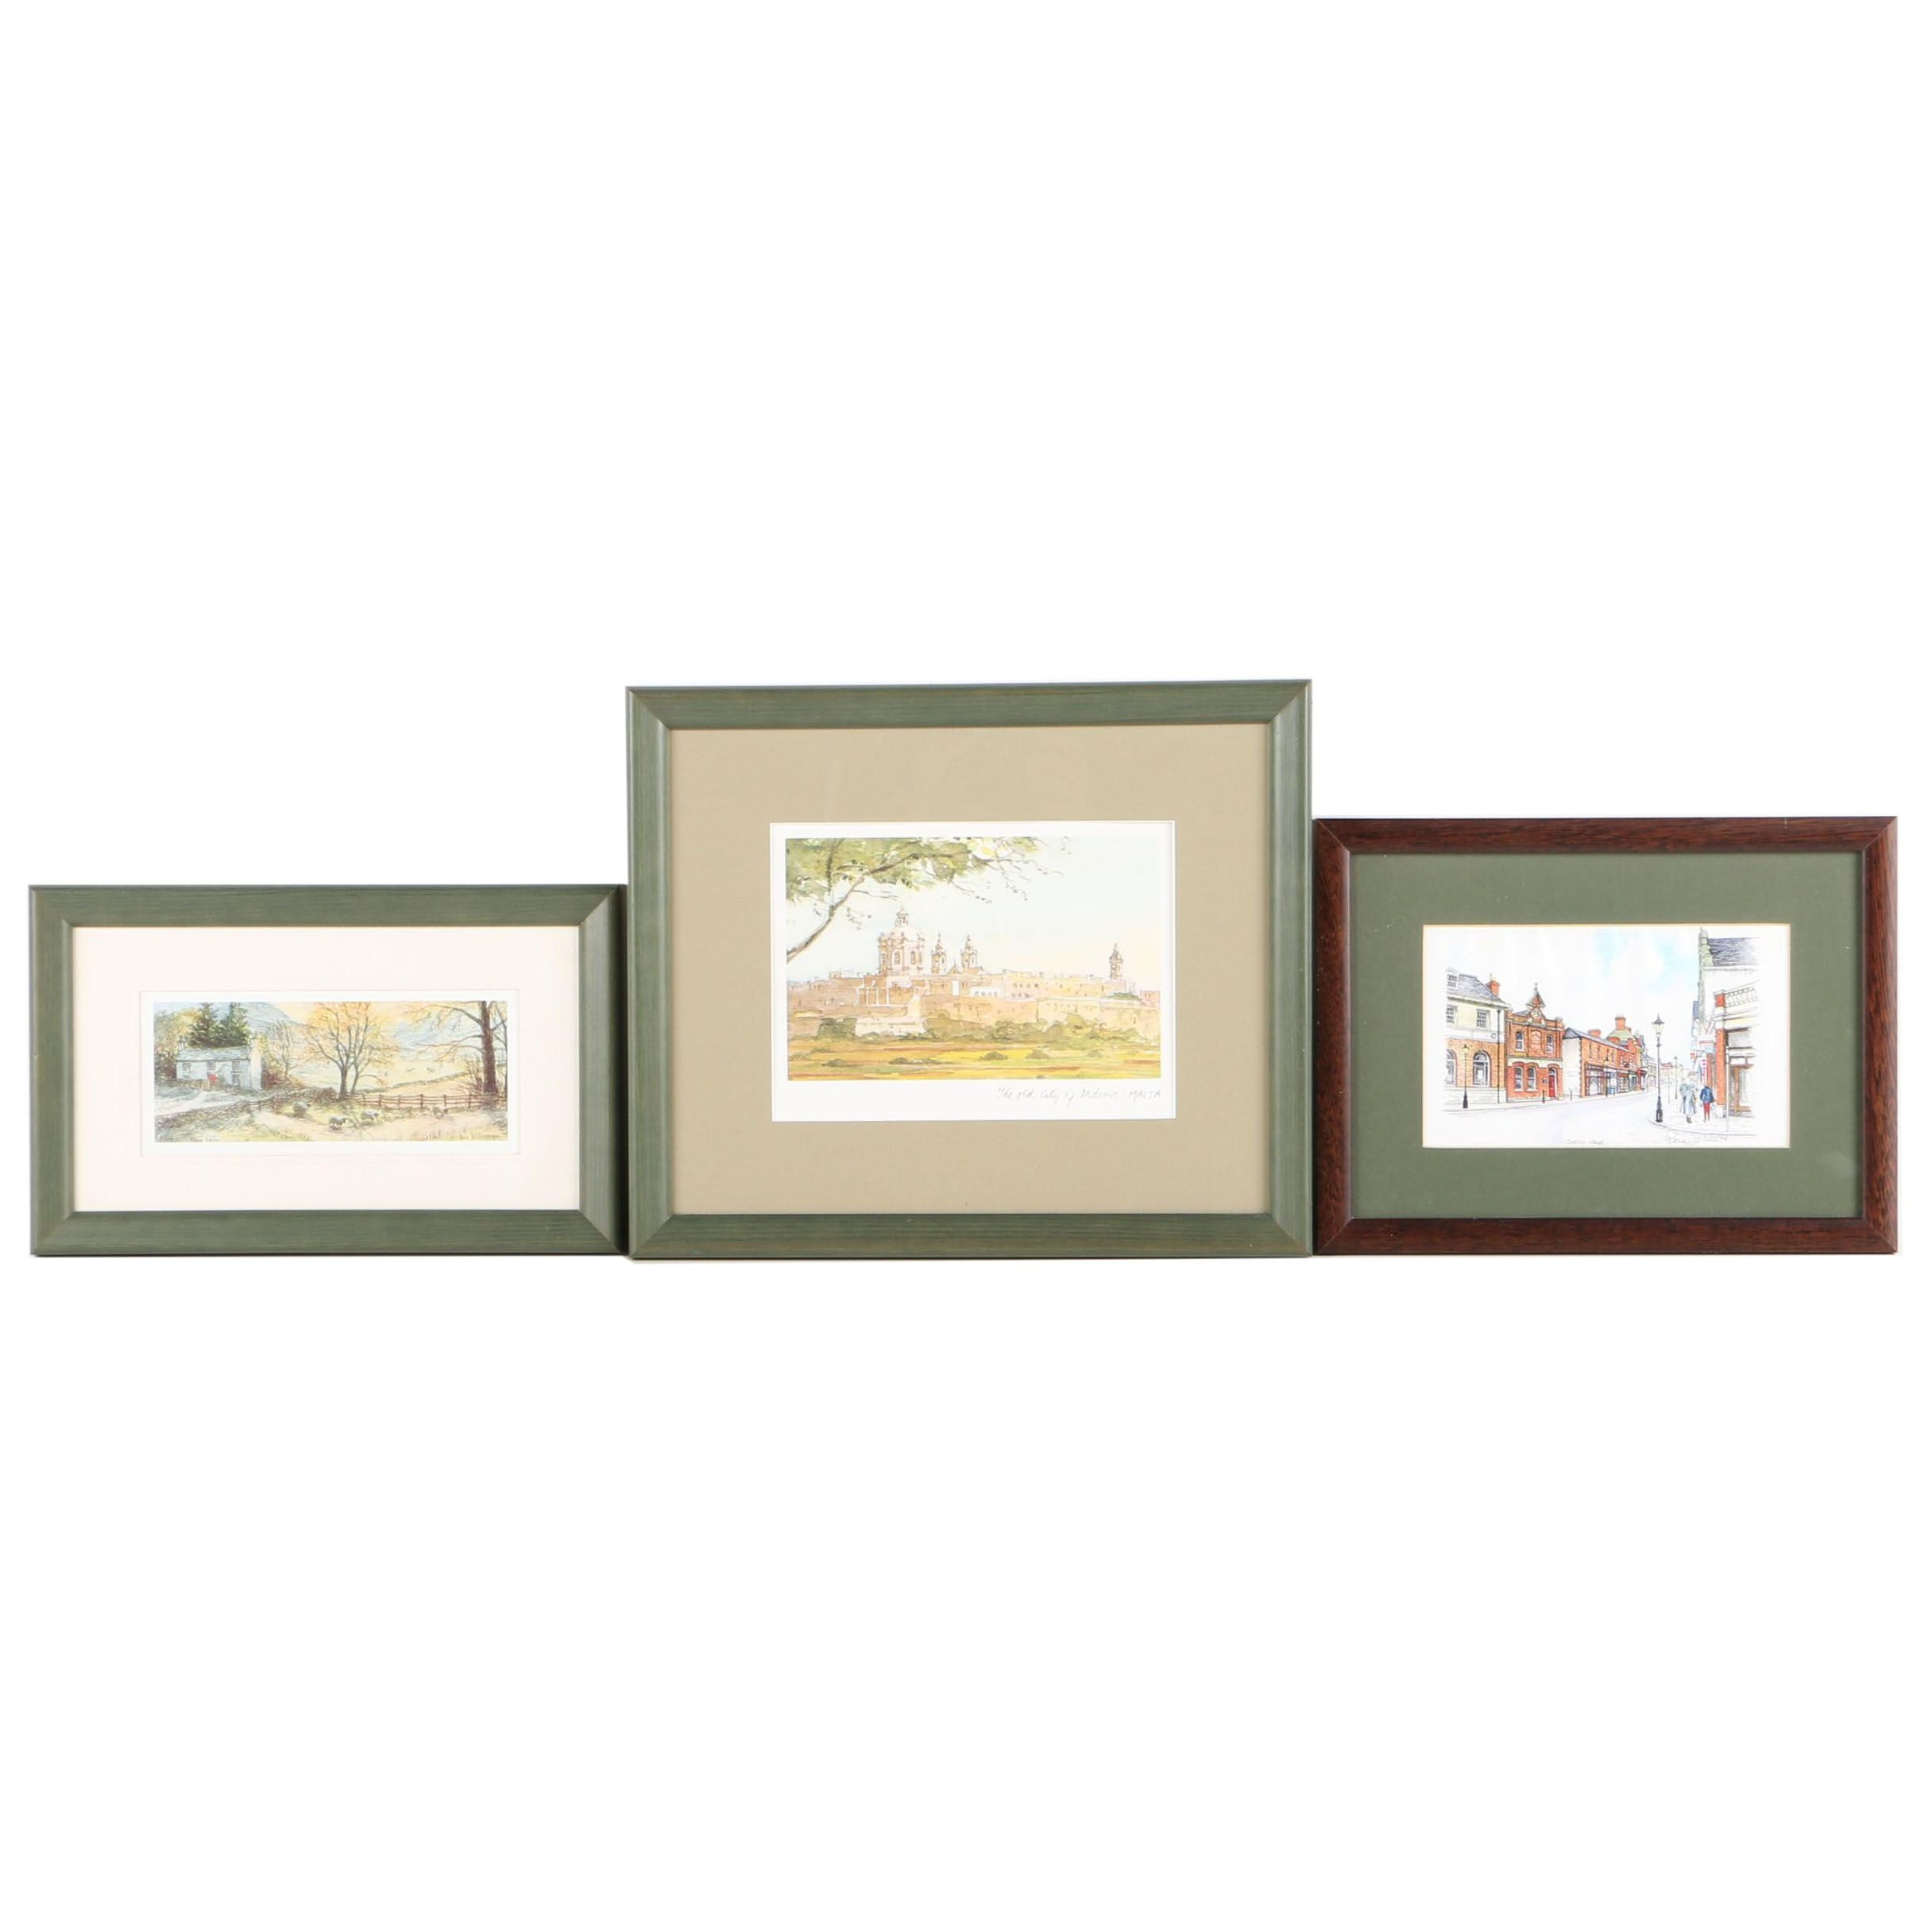 Reproduction Prints on Paper of Farm Scene, Malta, and a Village